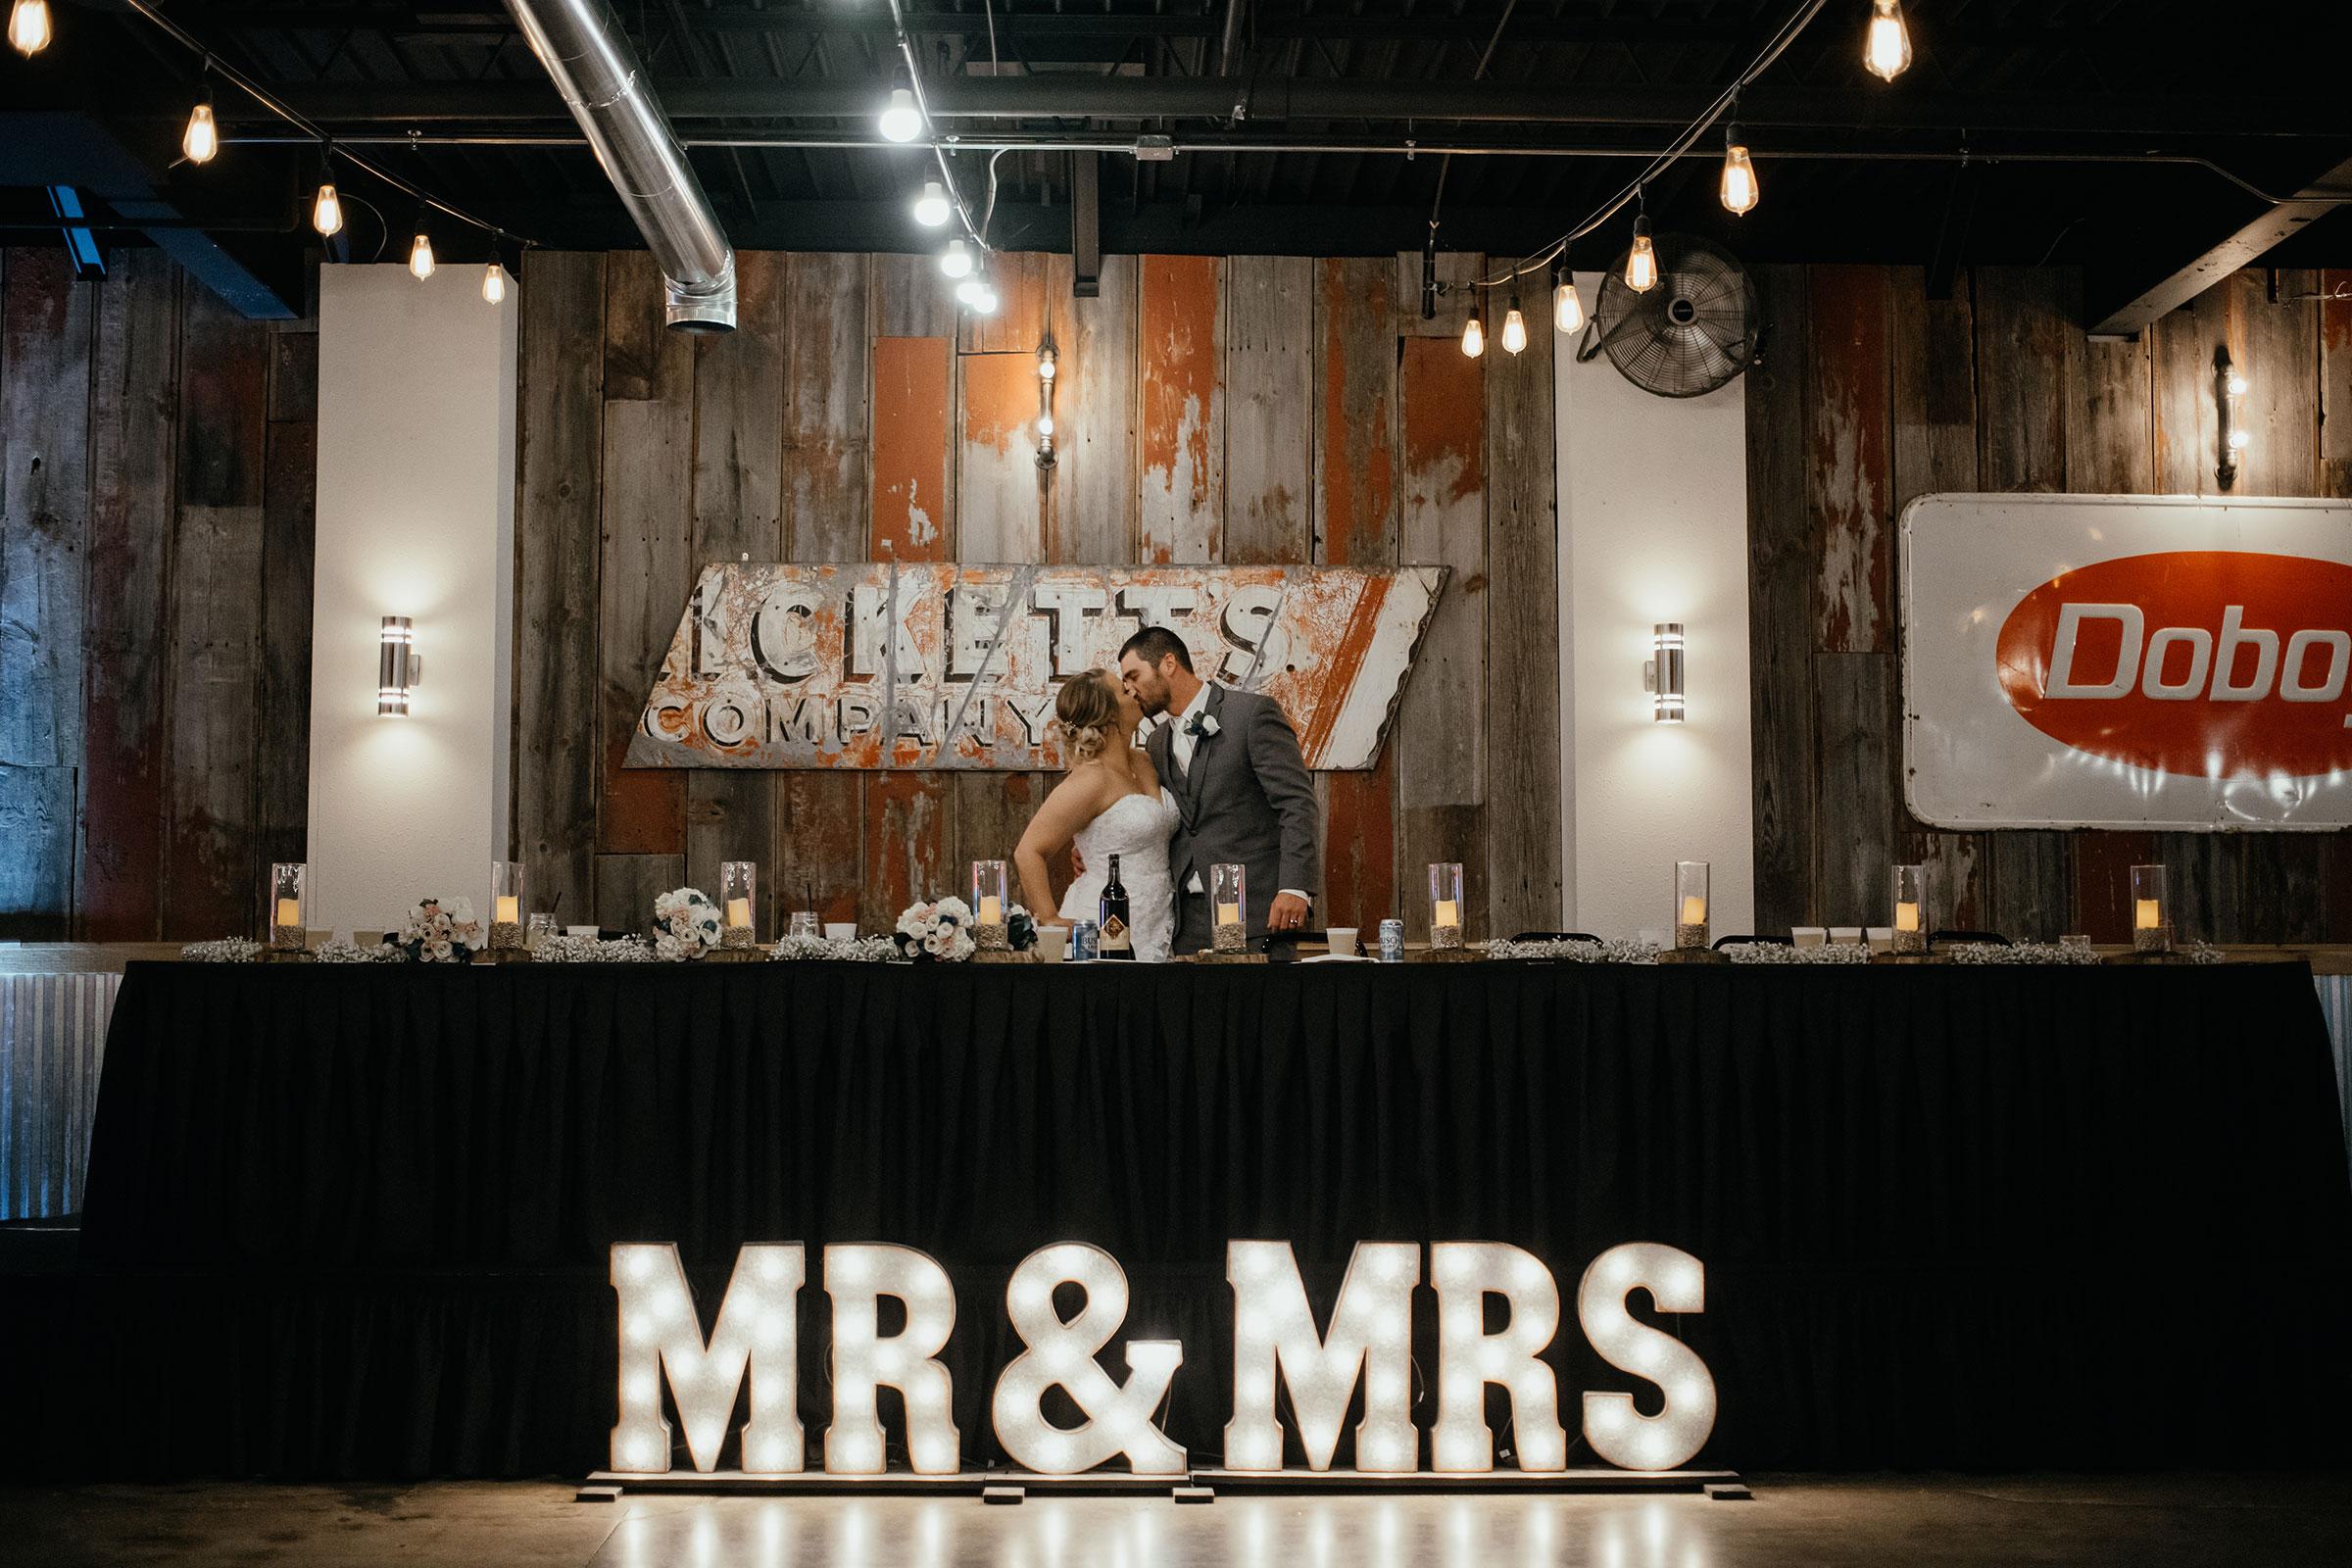 bride-groom-kissing-at-head-table-decades-event-center-building-desmoines-iowa-raelyn-ramey-photography..jpg